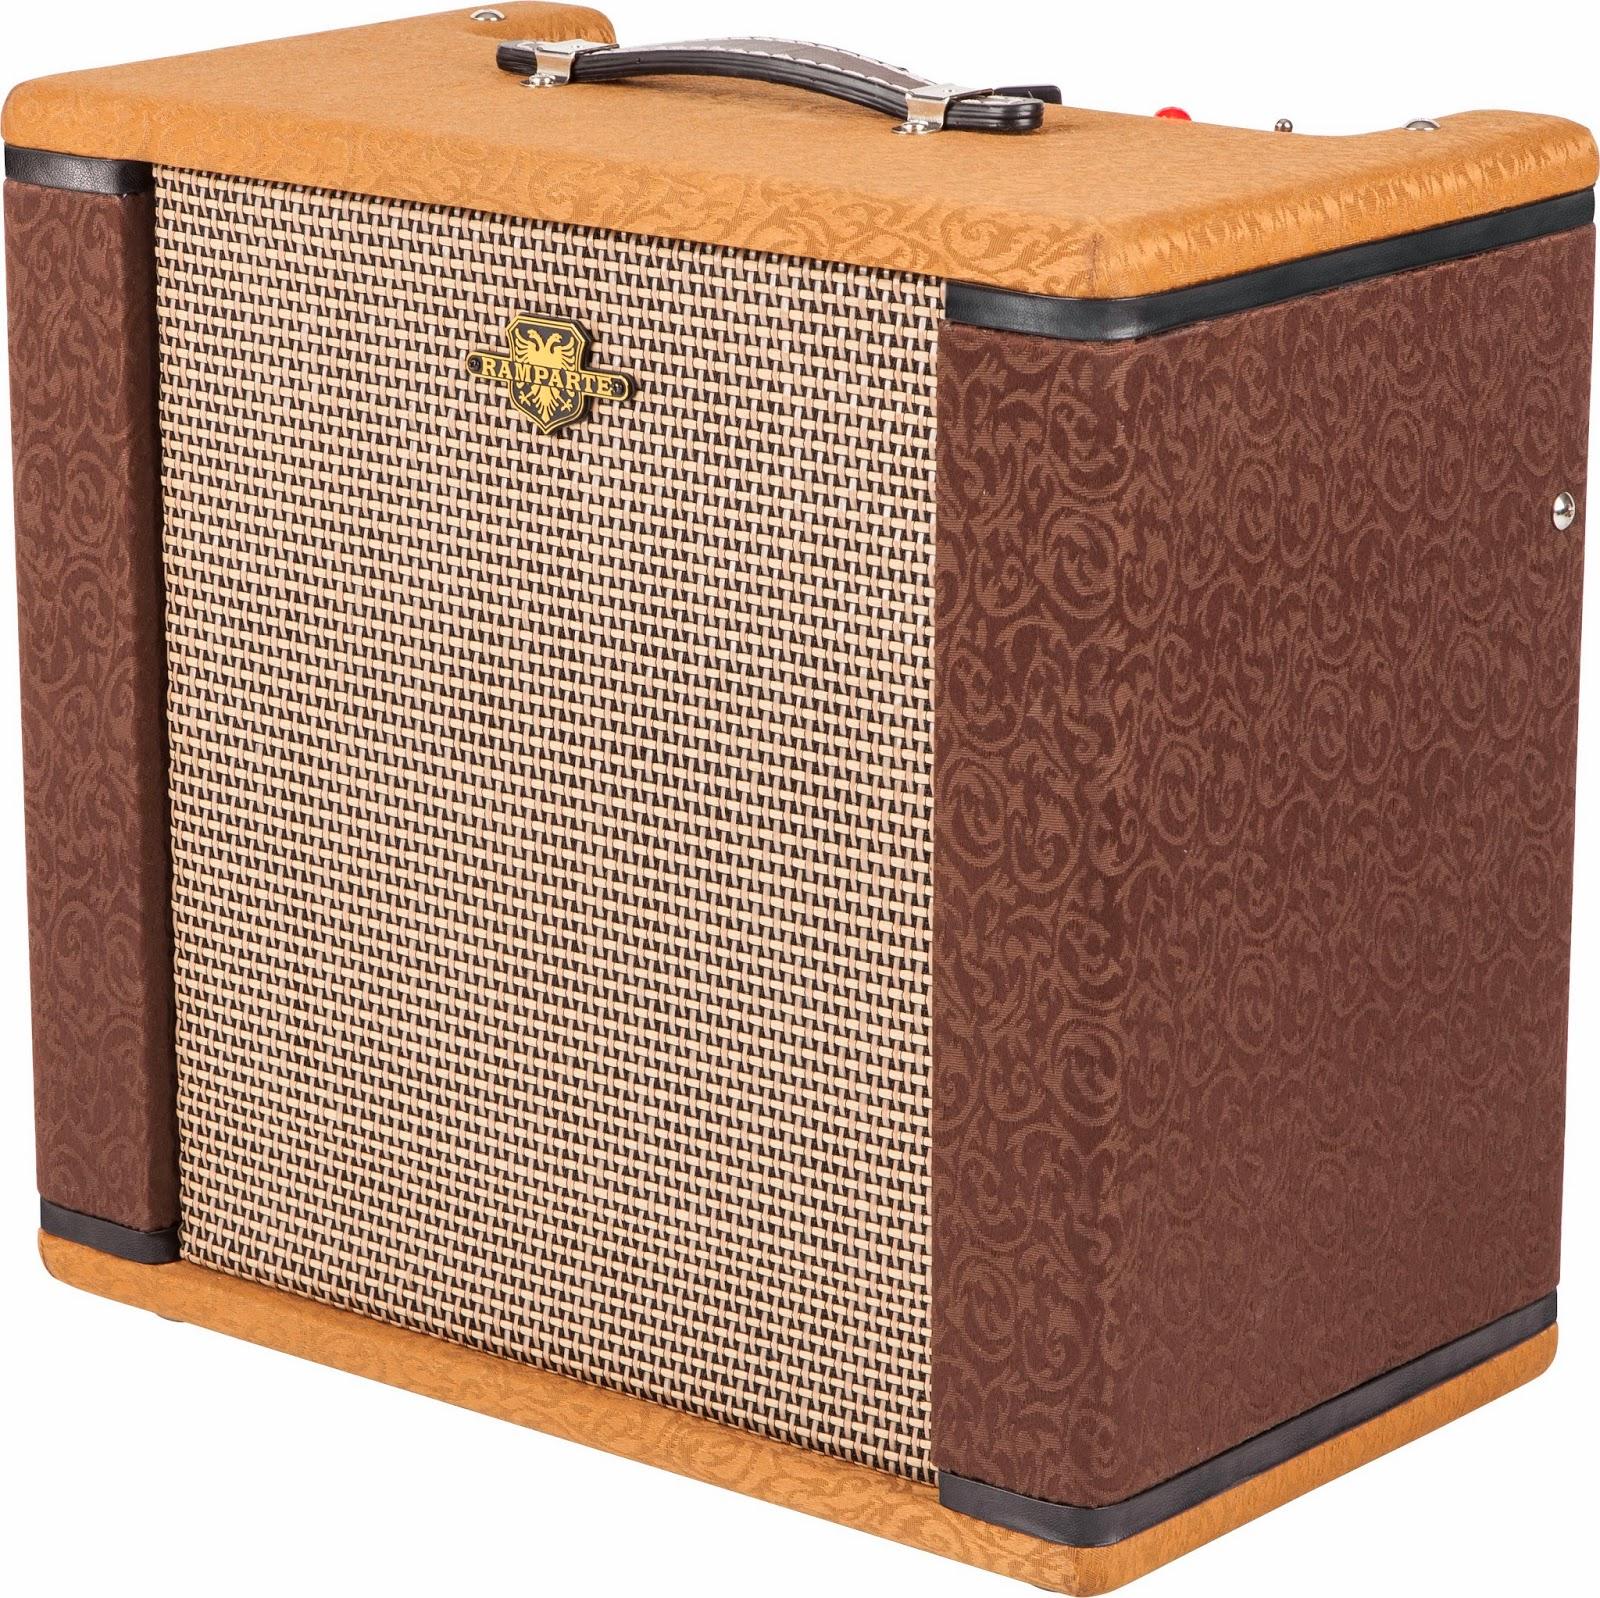 fender pawn shop ramparte amp for the den stratocaster guitar culture stratoblogster